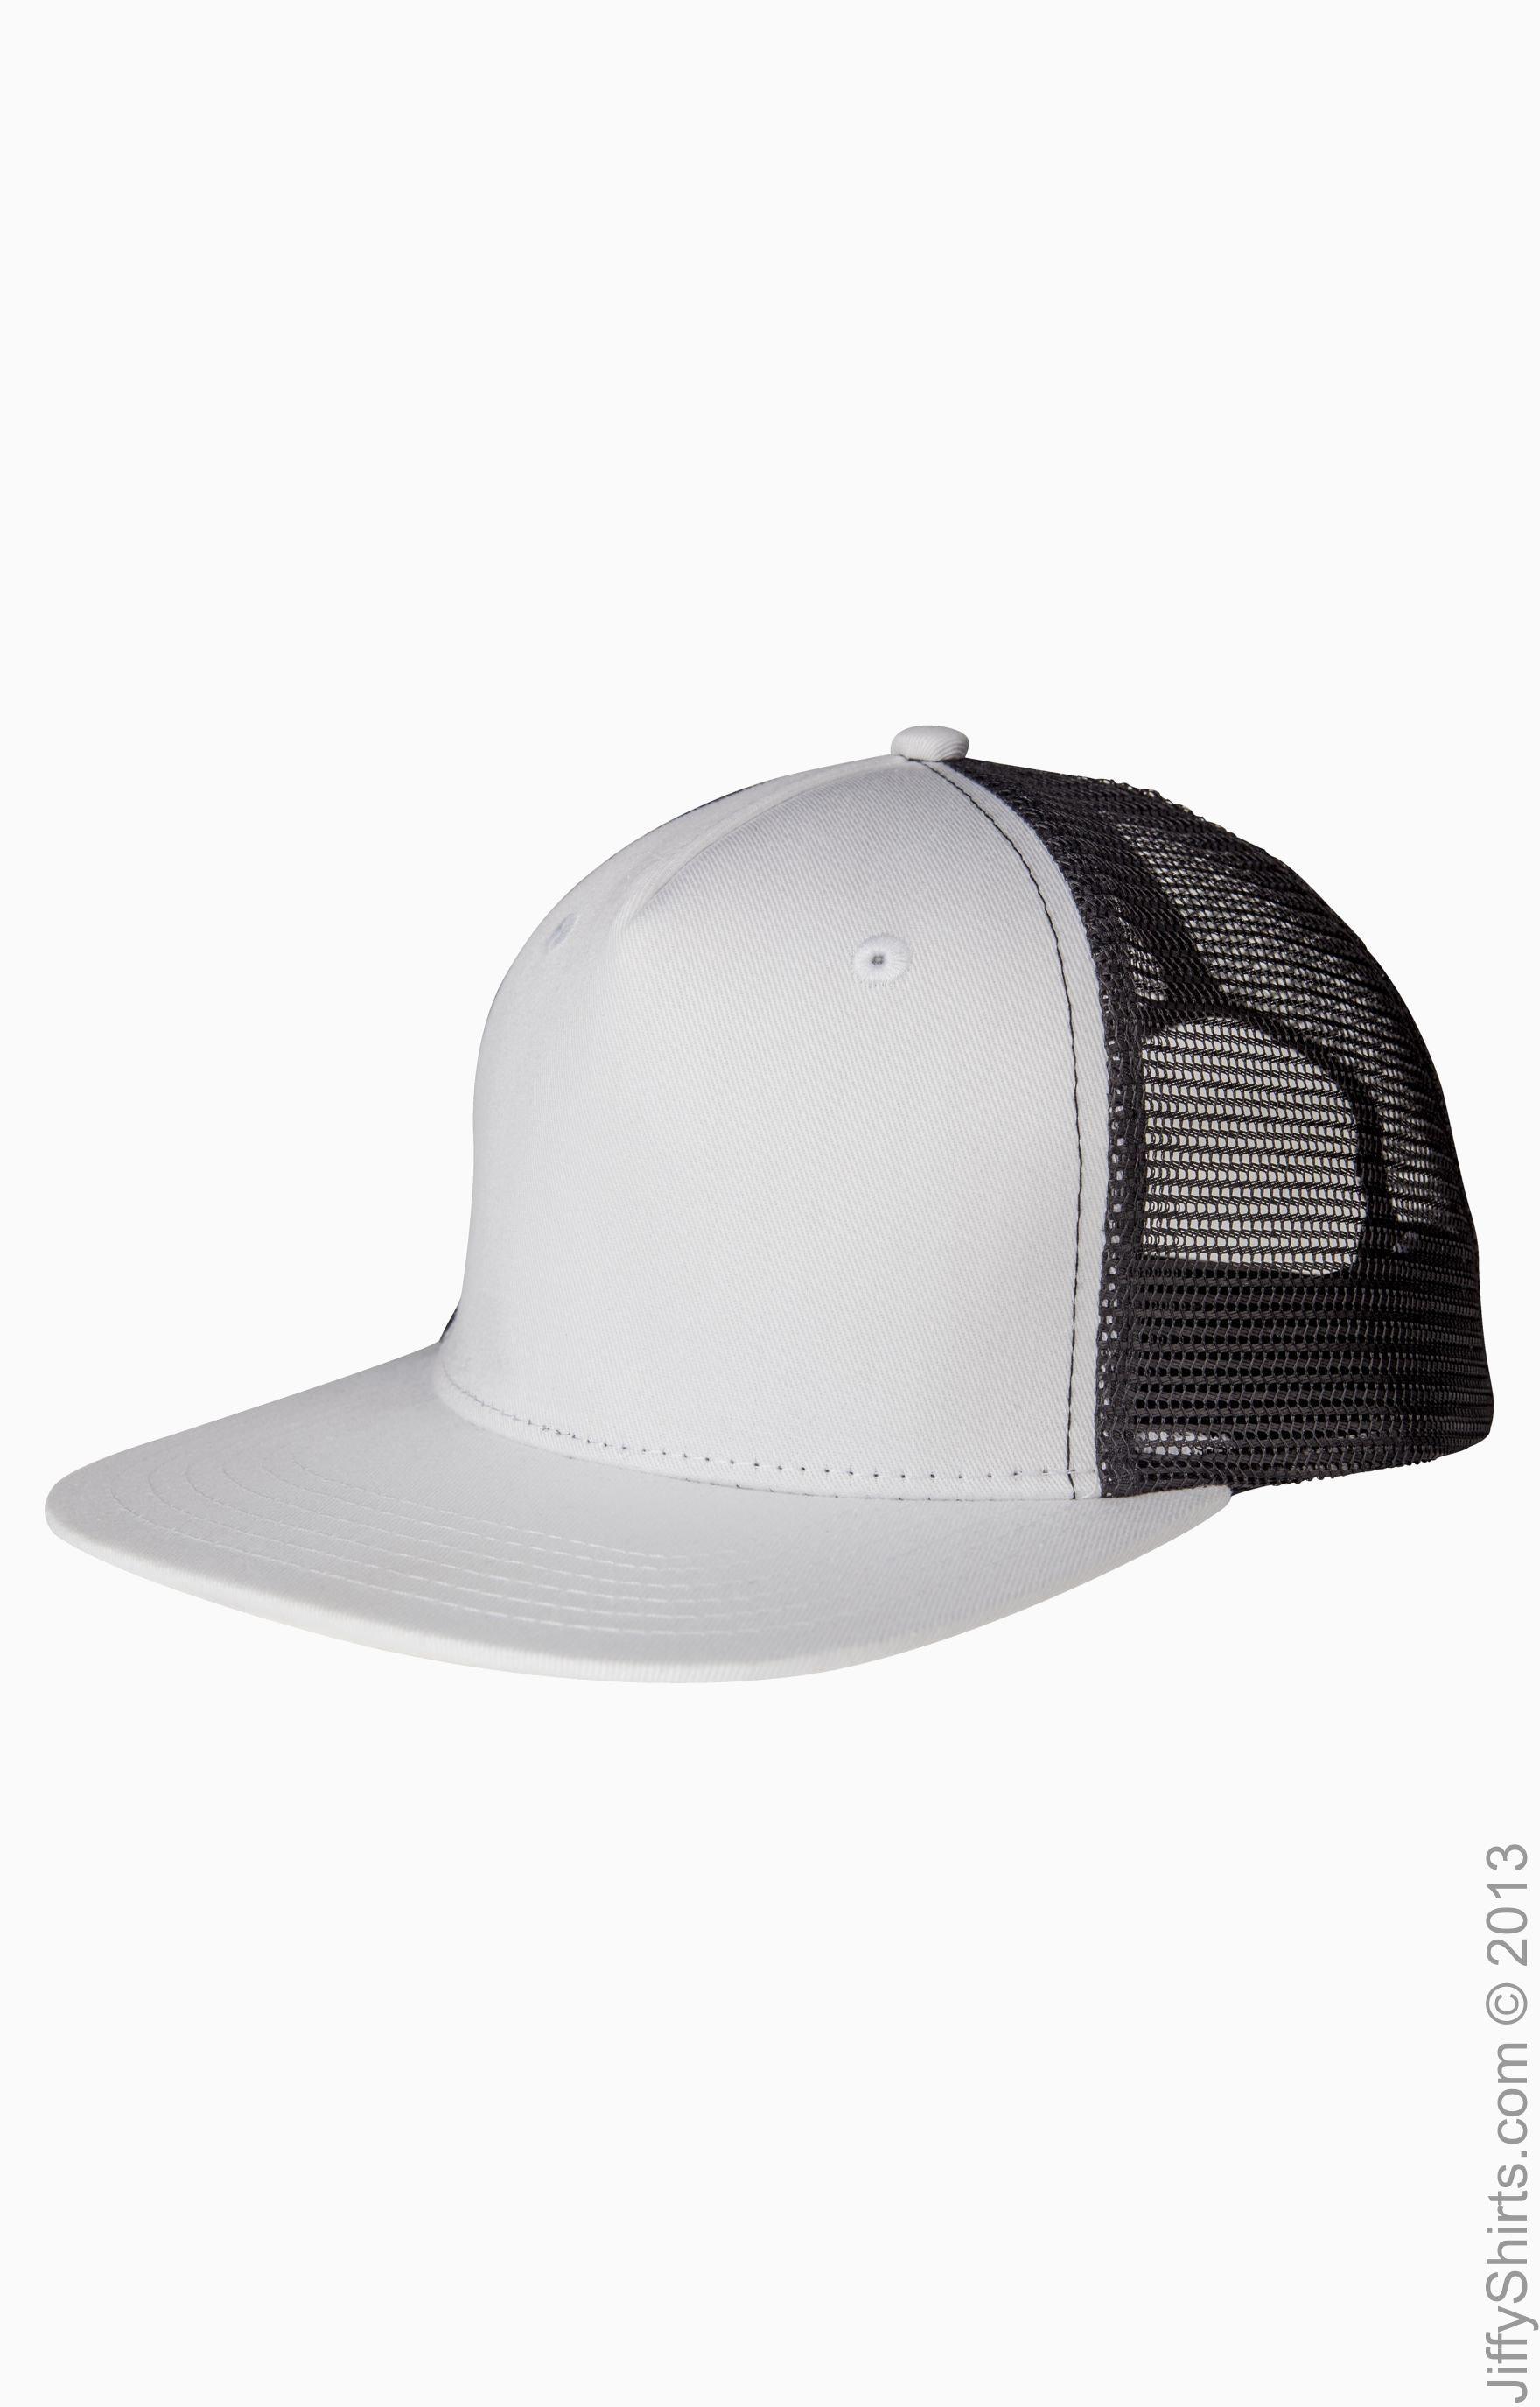 Big Accessories BX025 White/Black